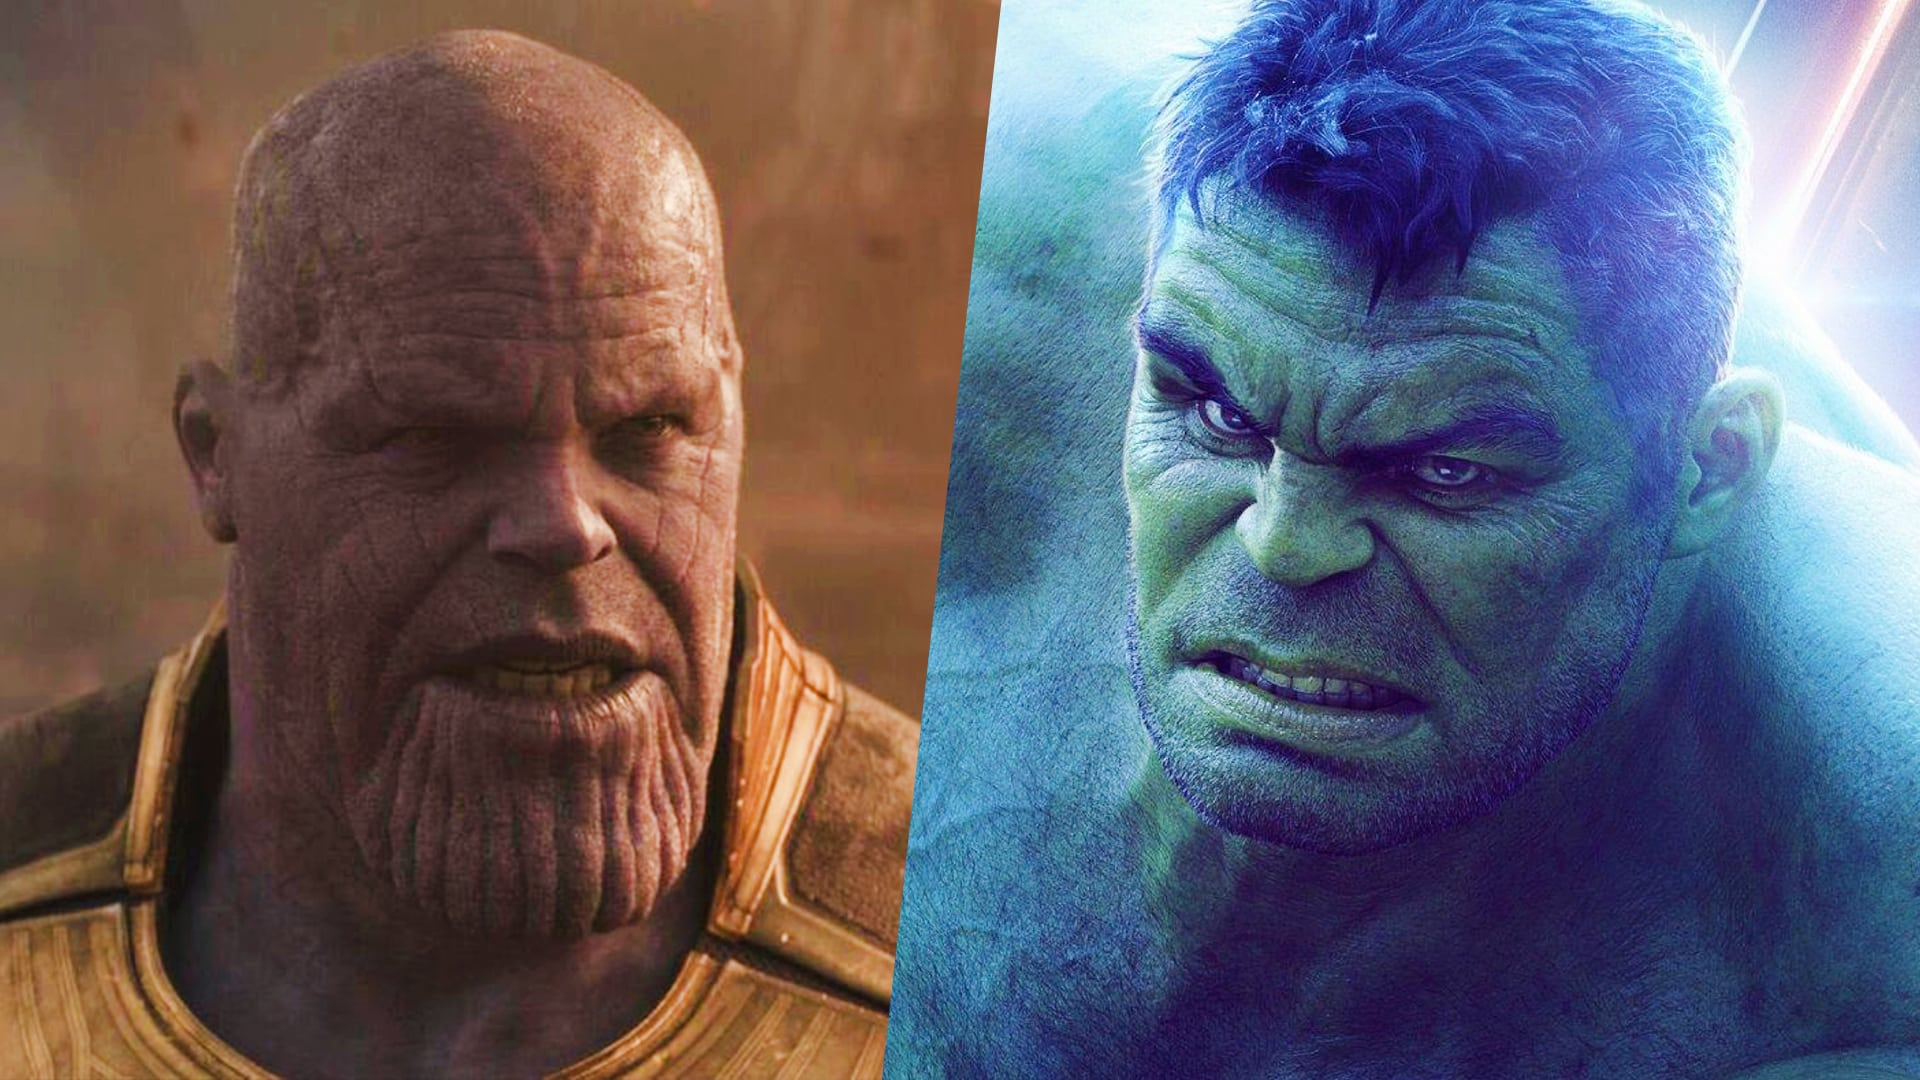 Aký problém mal Hulk vo filme Avengers: Infinity War?